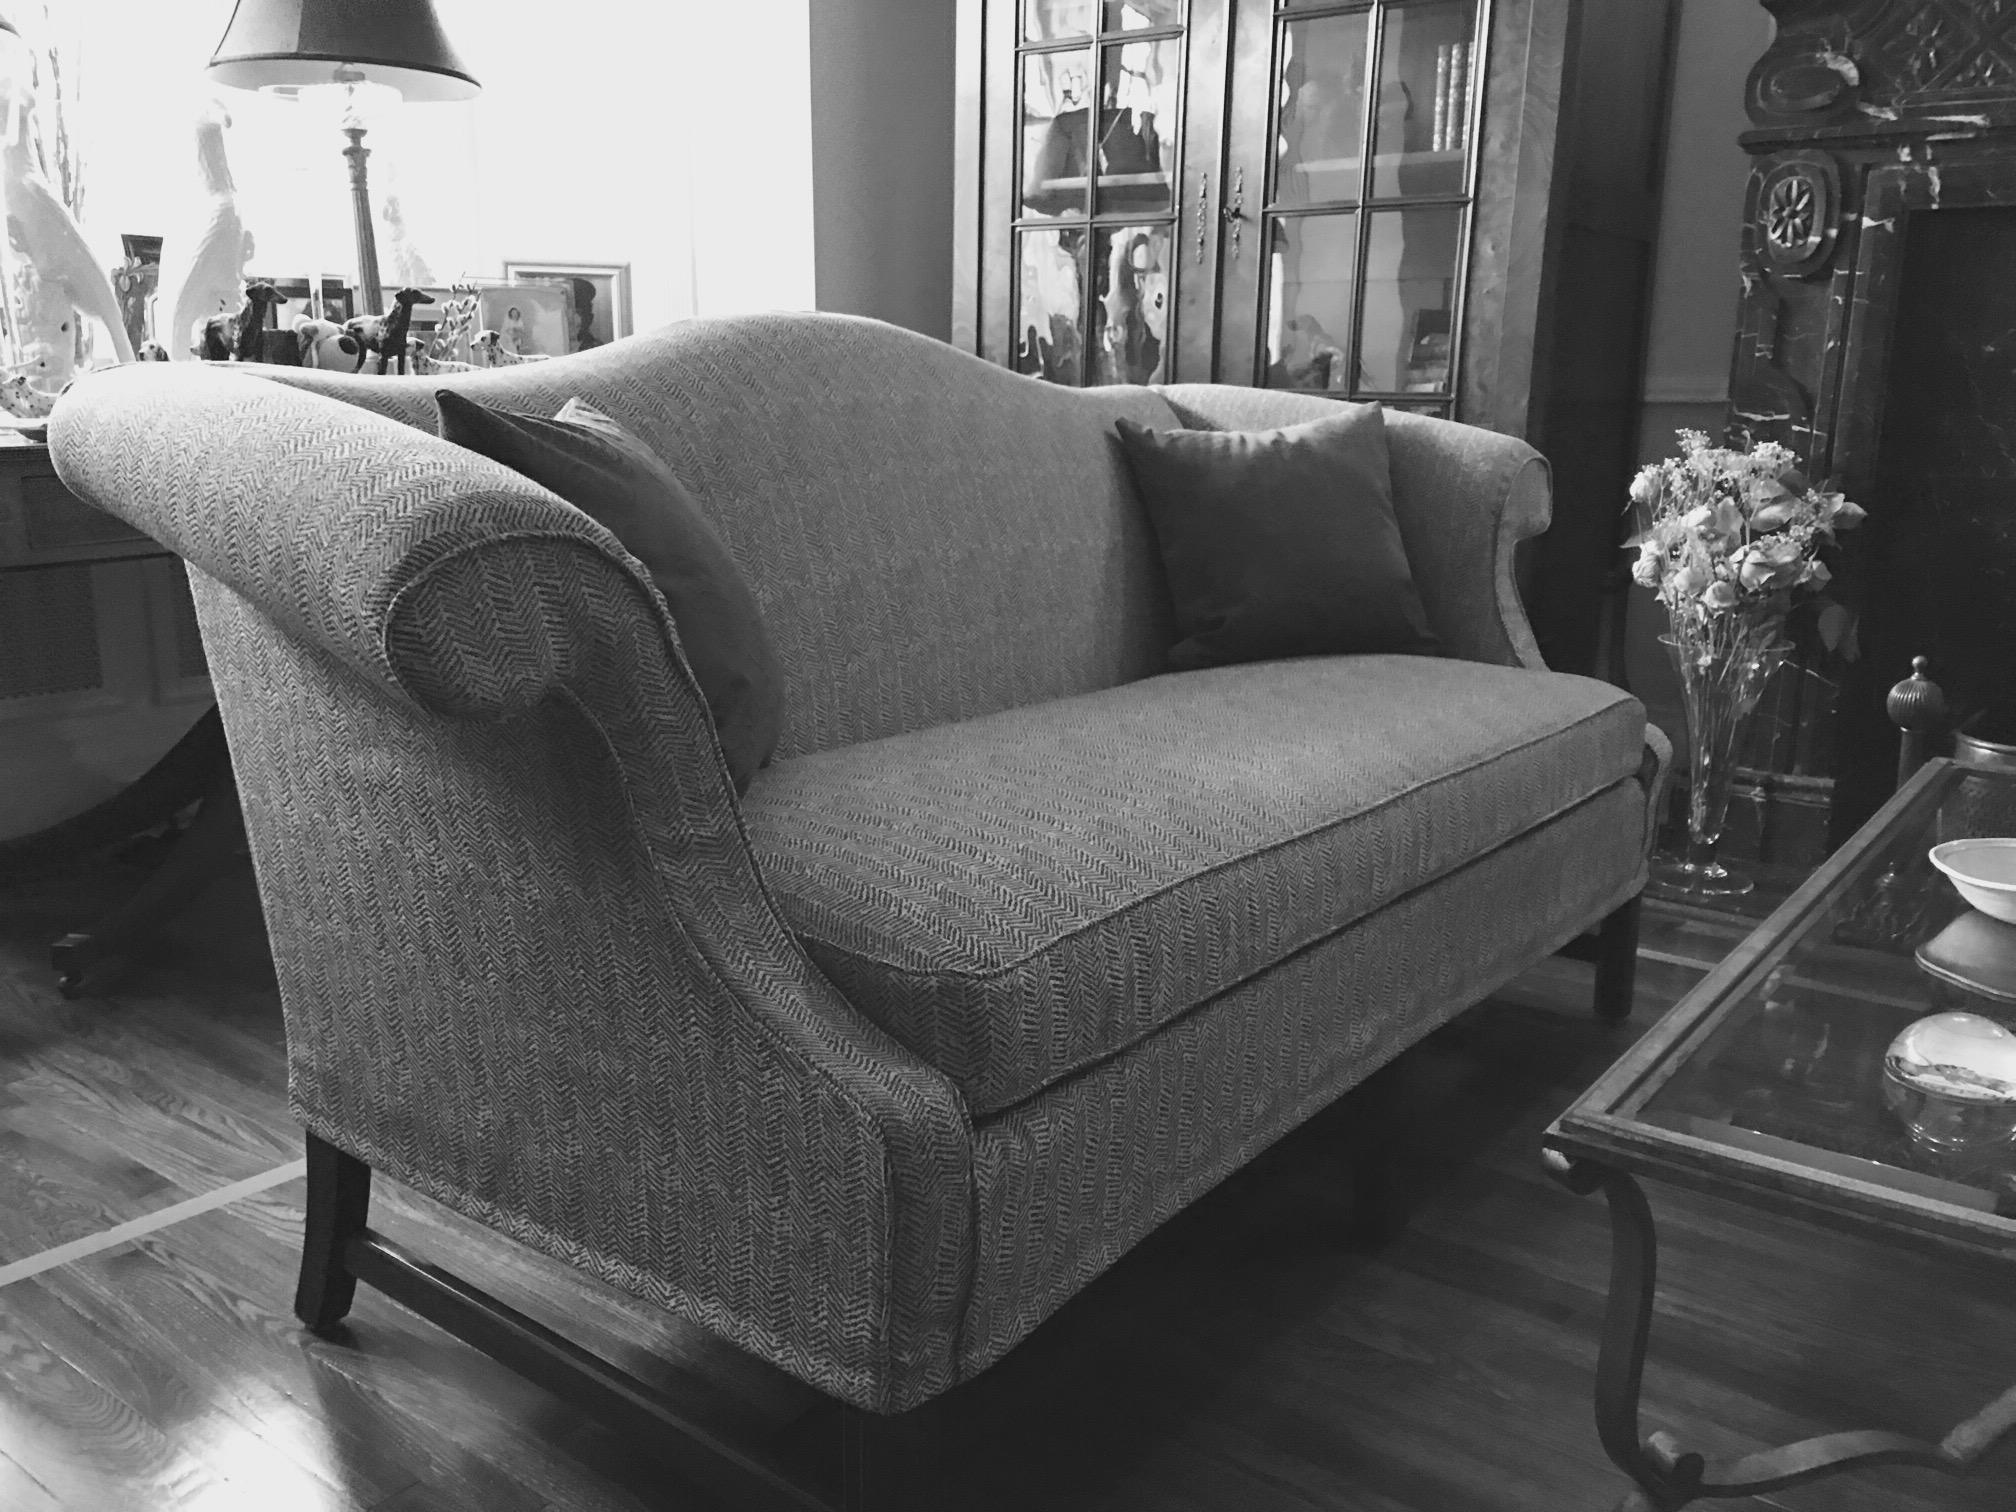 custom slipcovers potato skins slipcovers toronto. Black Bedroom Furniture Sets. Home Design Ideas